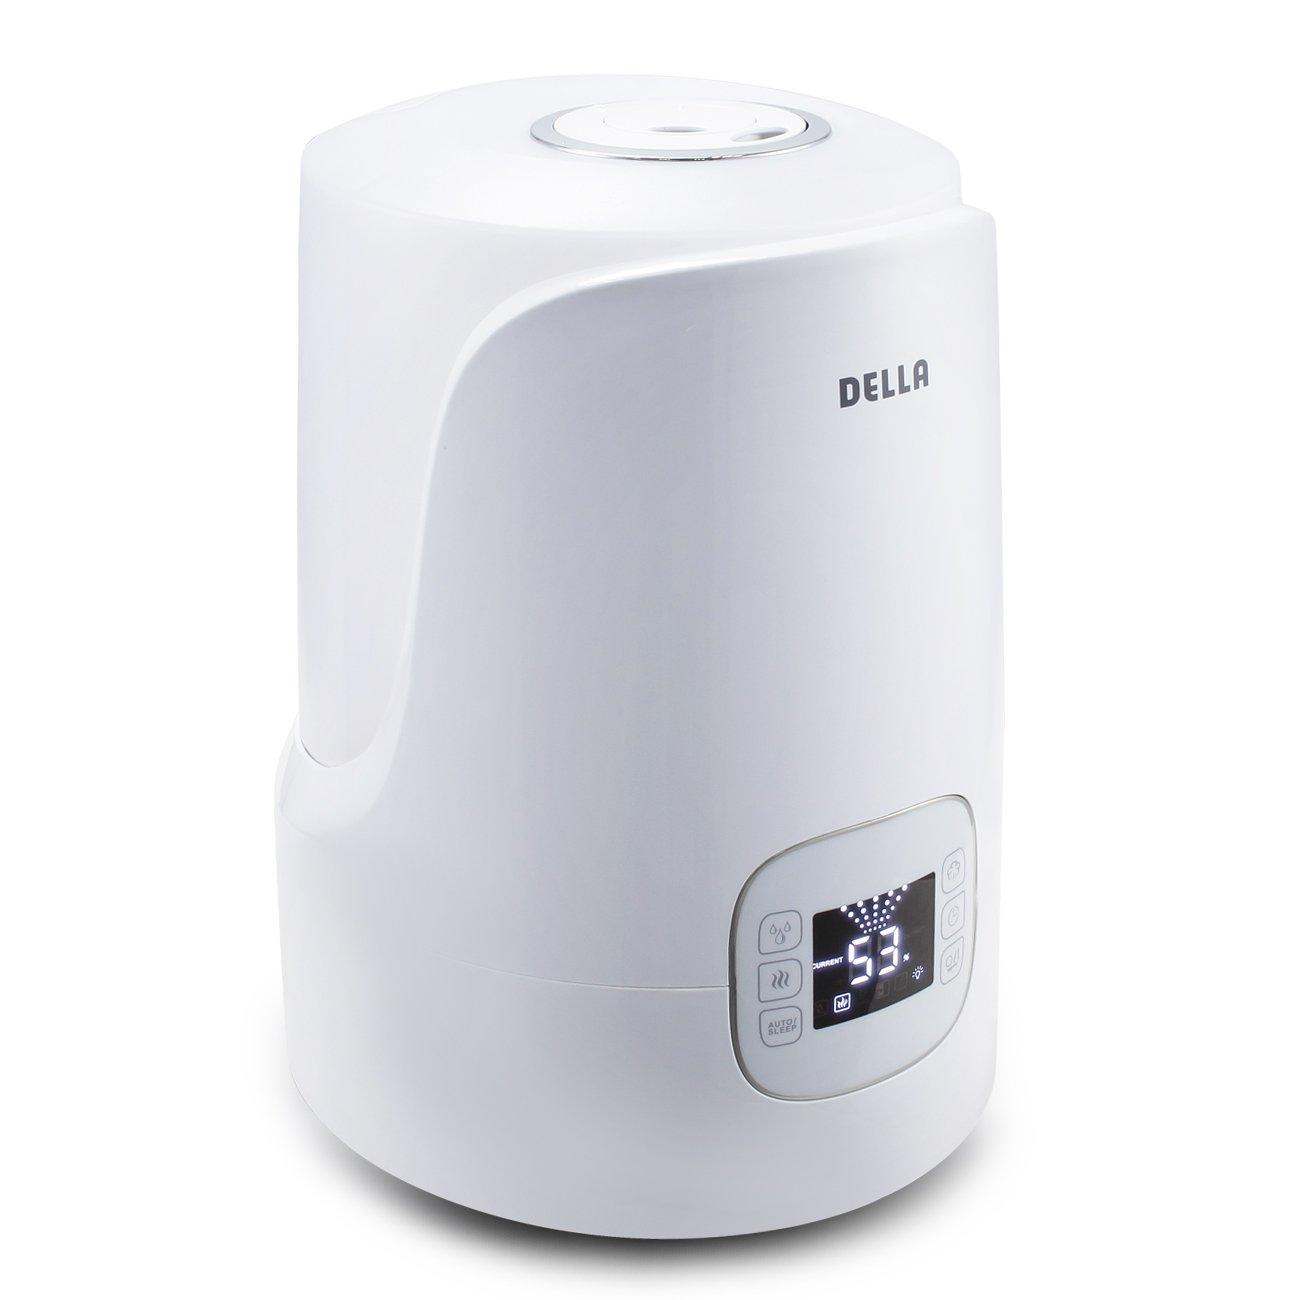 Della Warm & Cool Mist Humidifier Ultrasonic Humidifiers for Bedroom LED External Humidity Sensor 360° Rotatable Nozzle